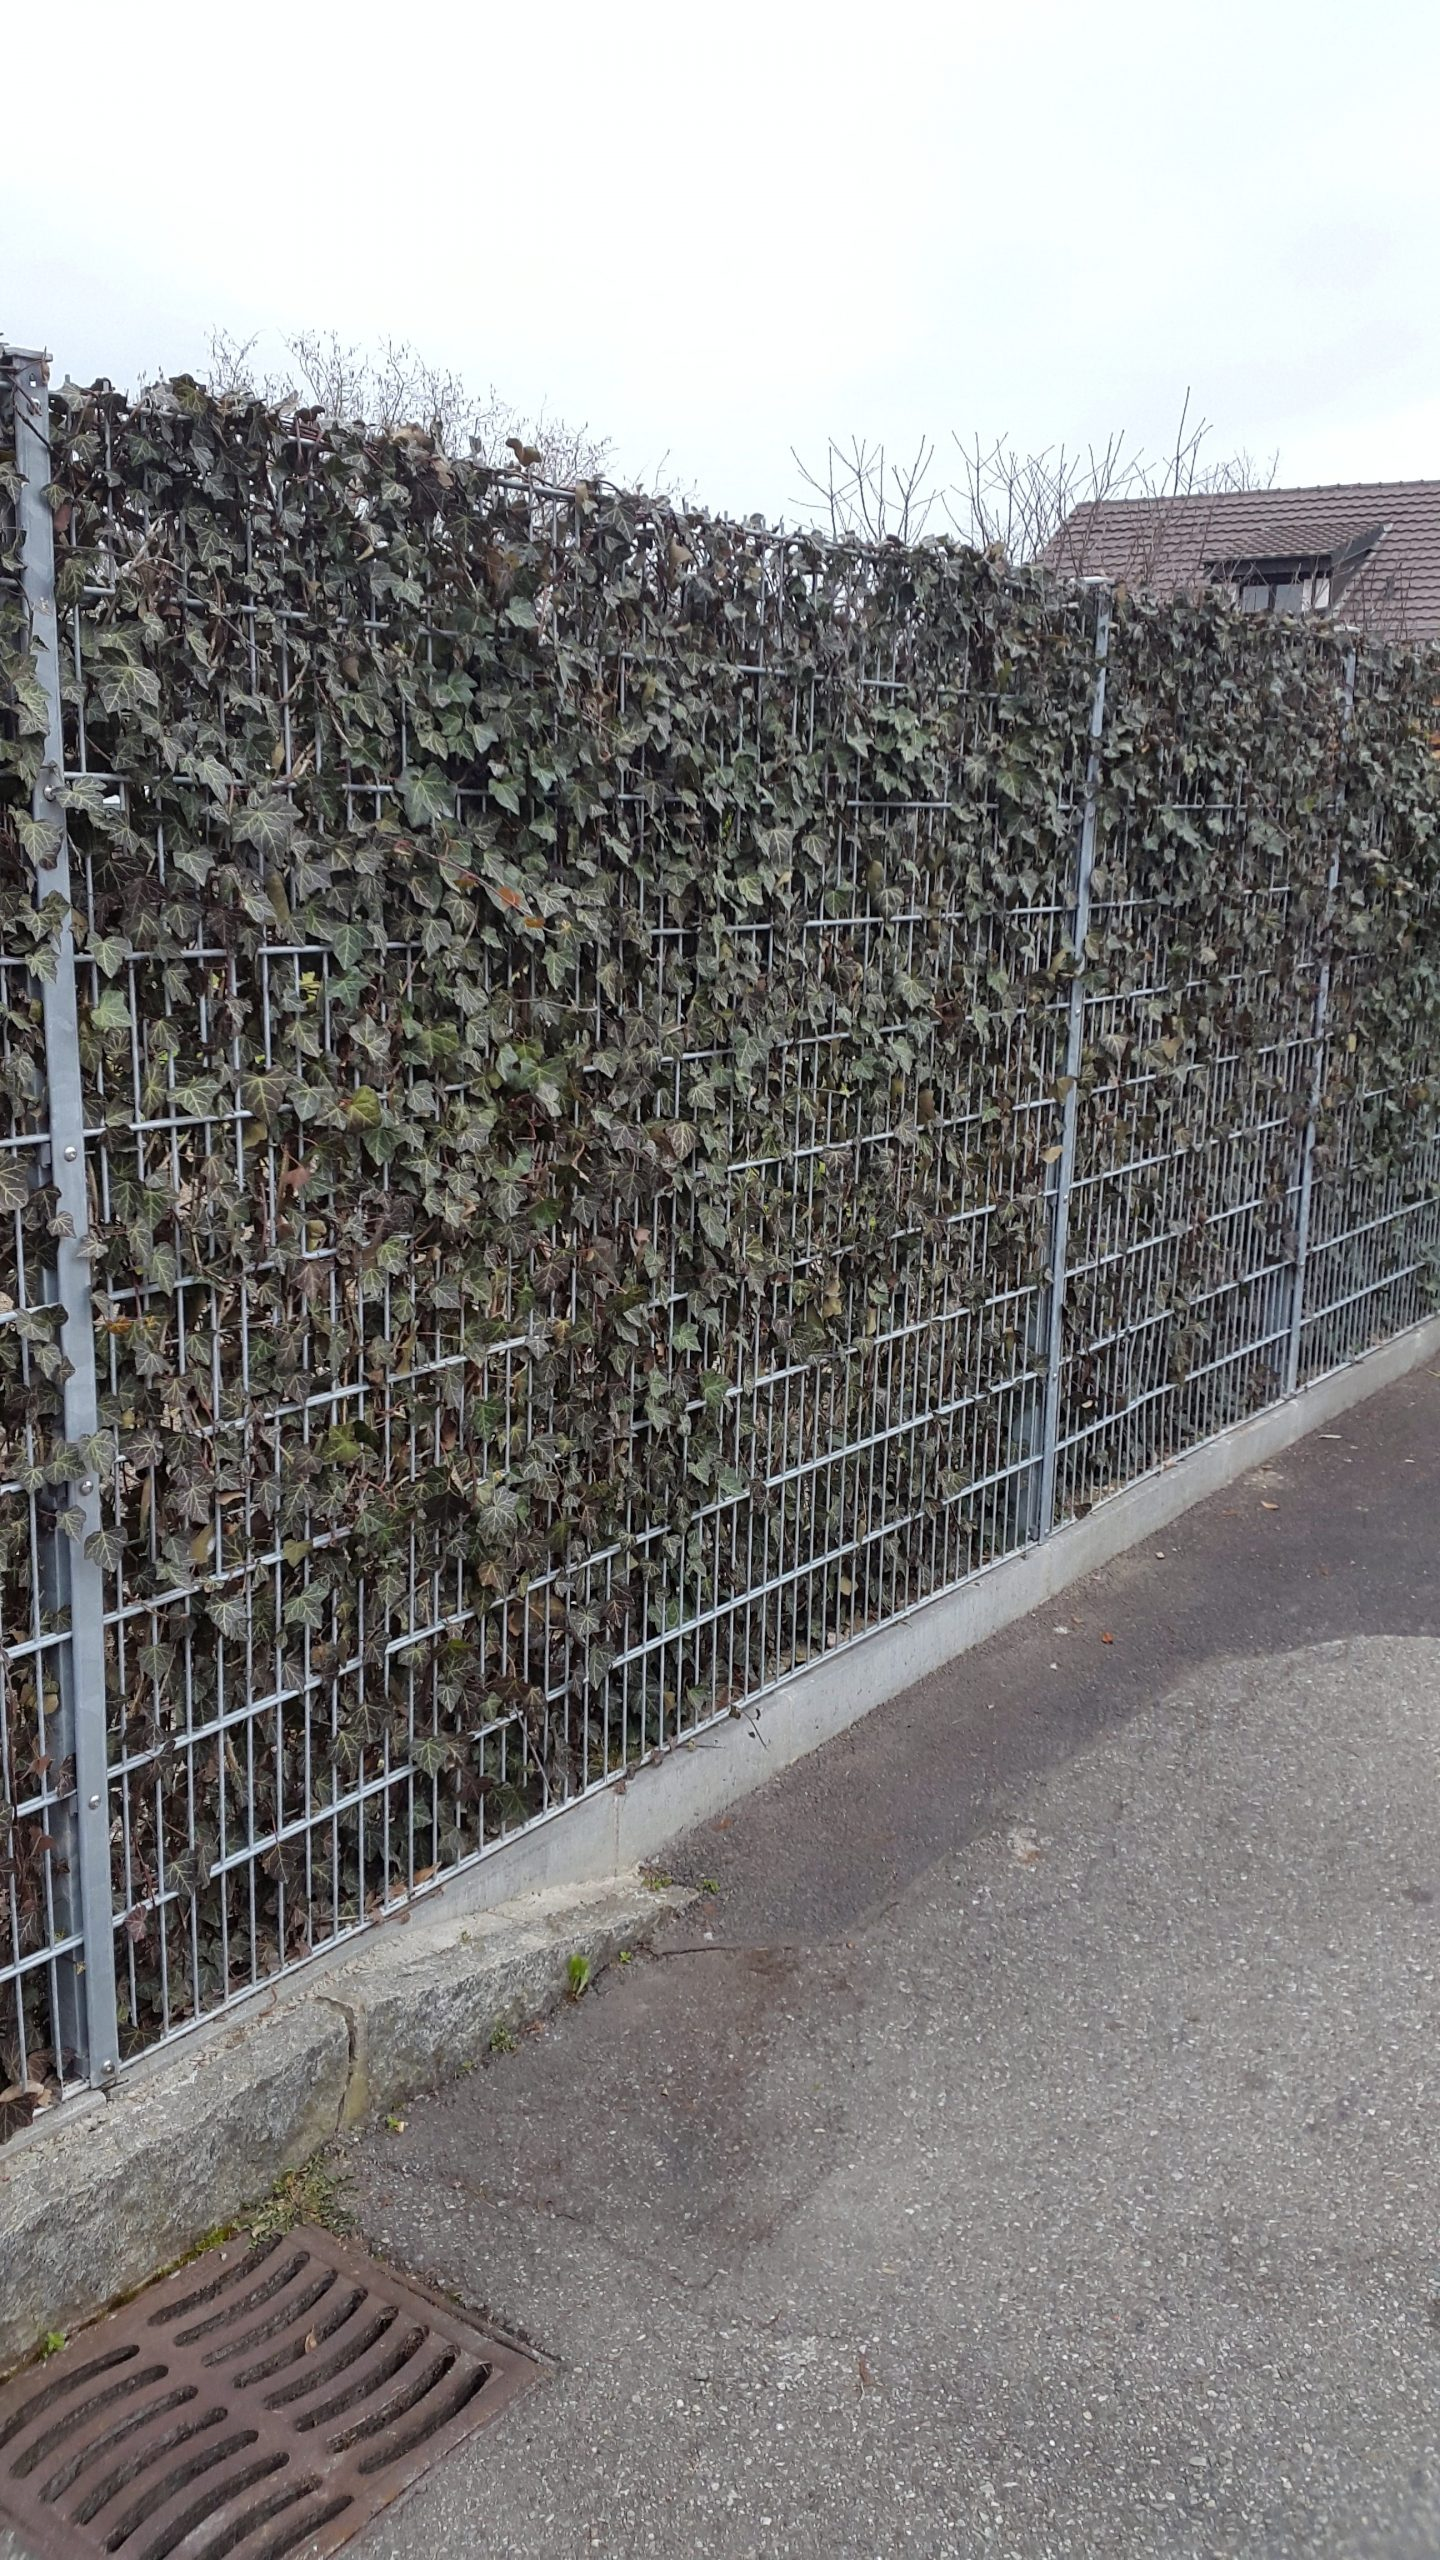 Grillage Sur La Bordure – Robi Jardin à Bordure De Jardin En Grillage